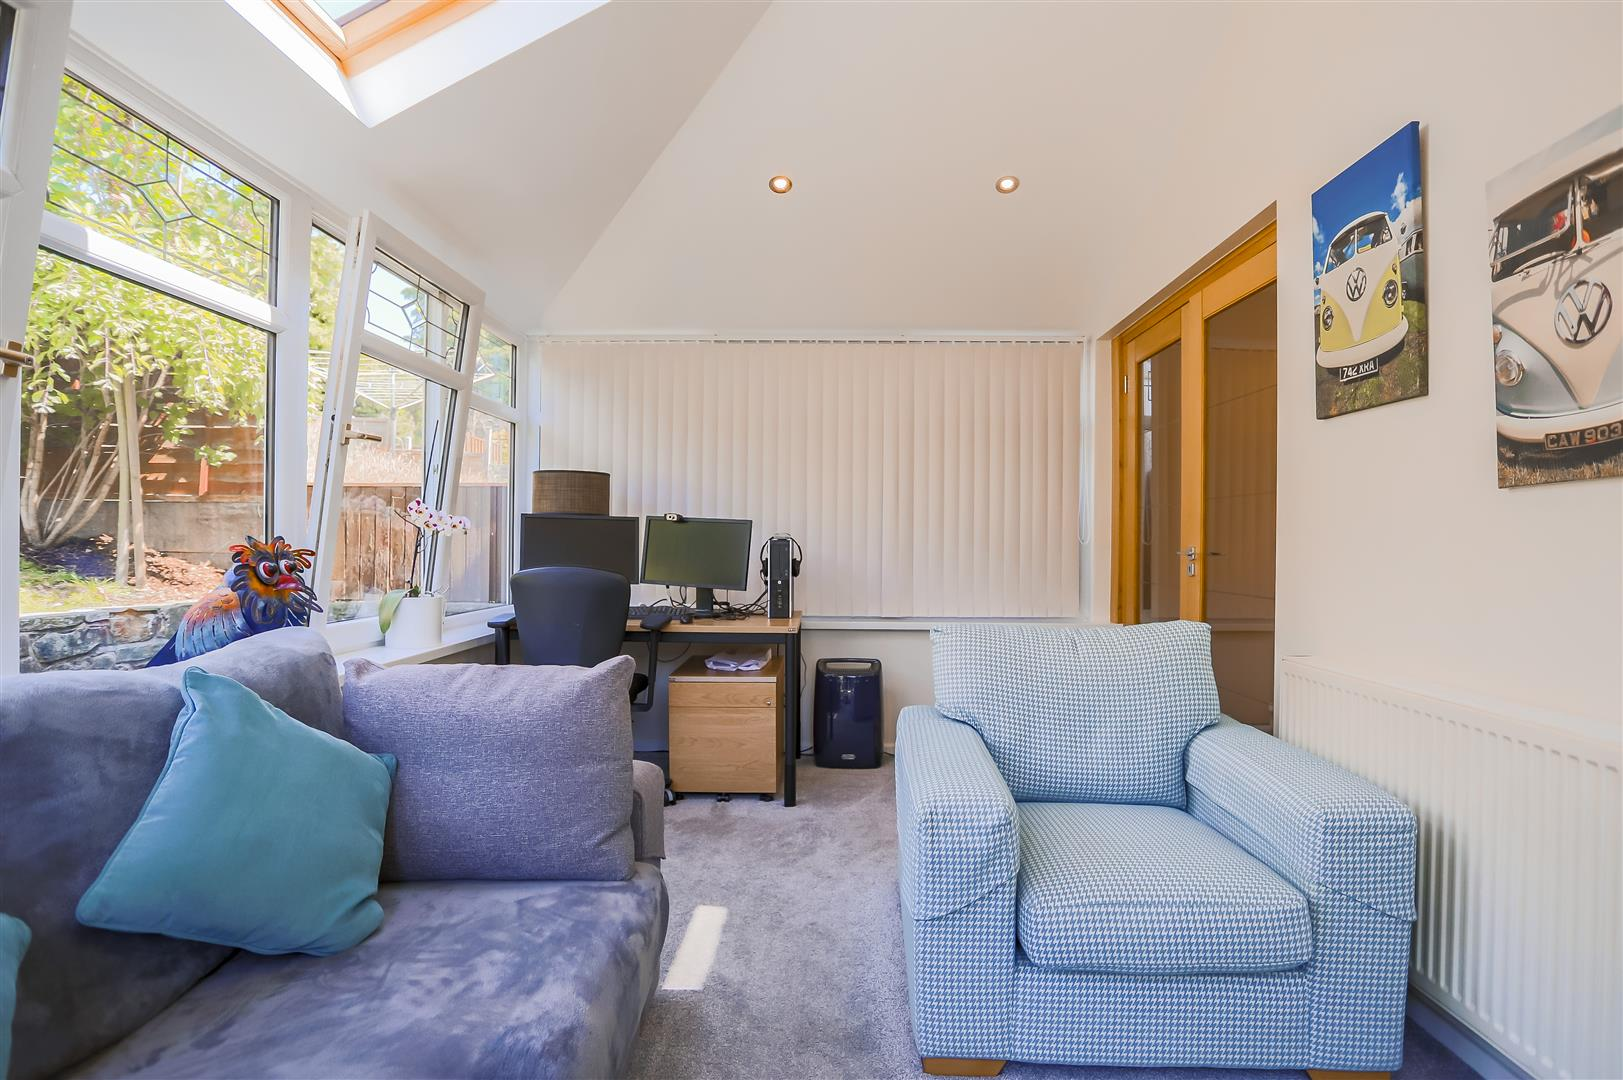 4 Bedroom Semi-detached House For Sale - Image 15